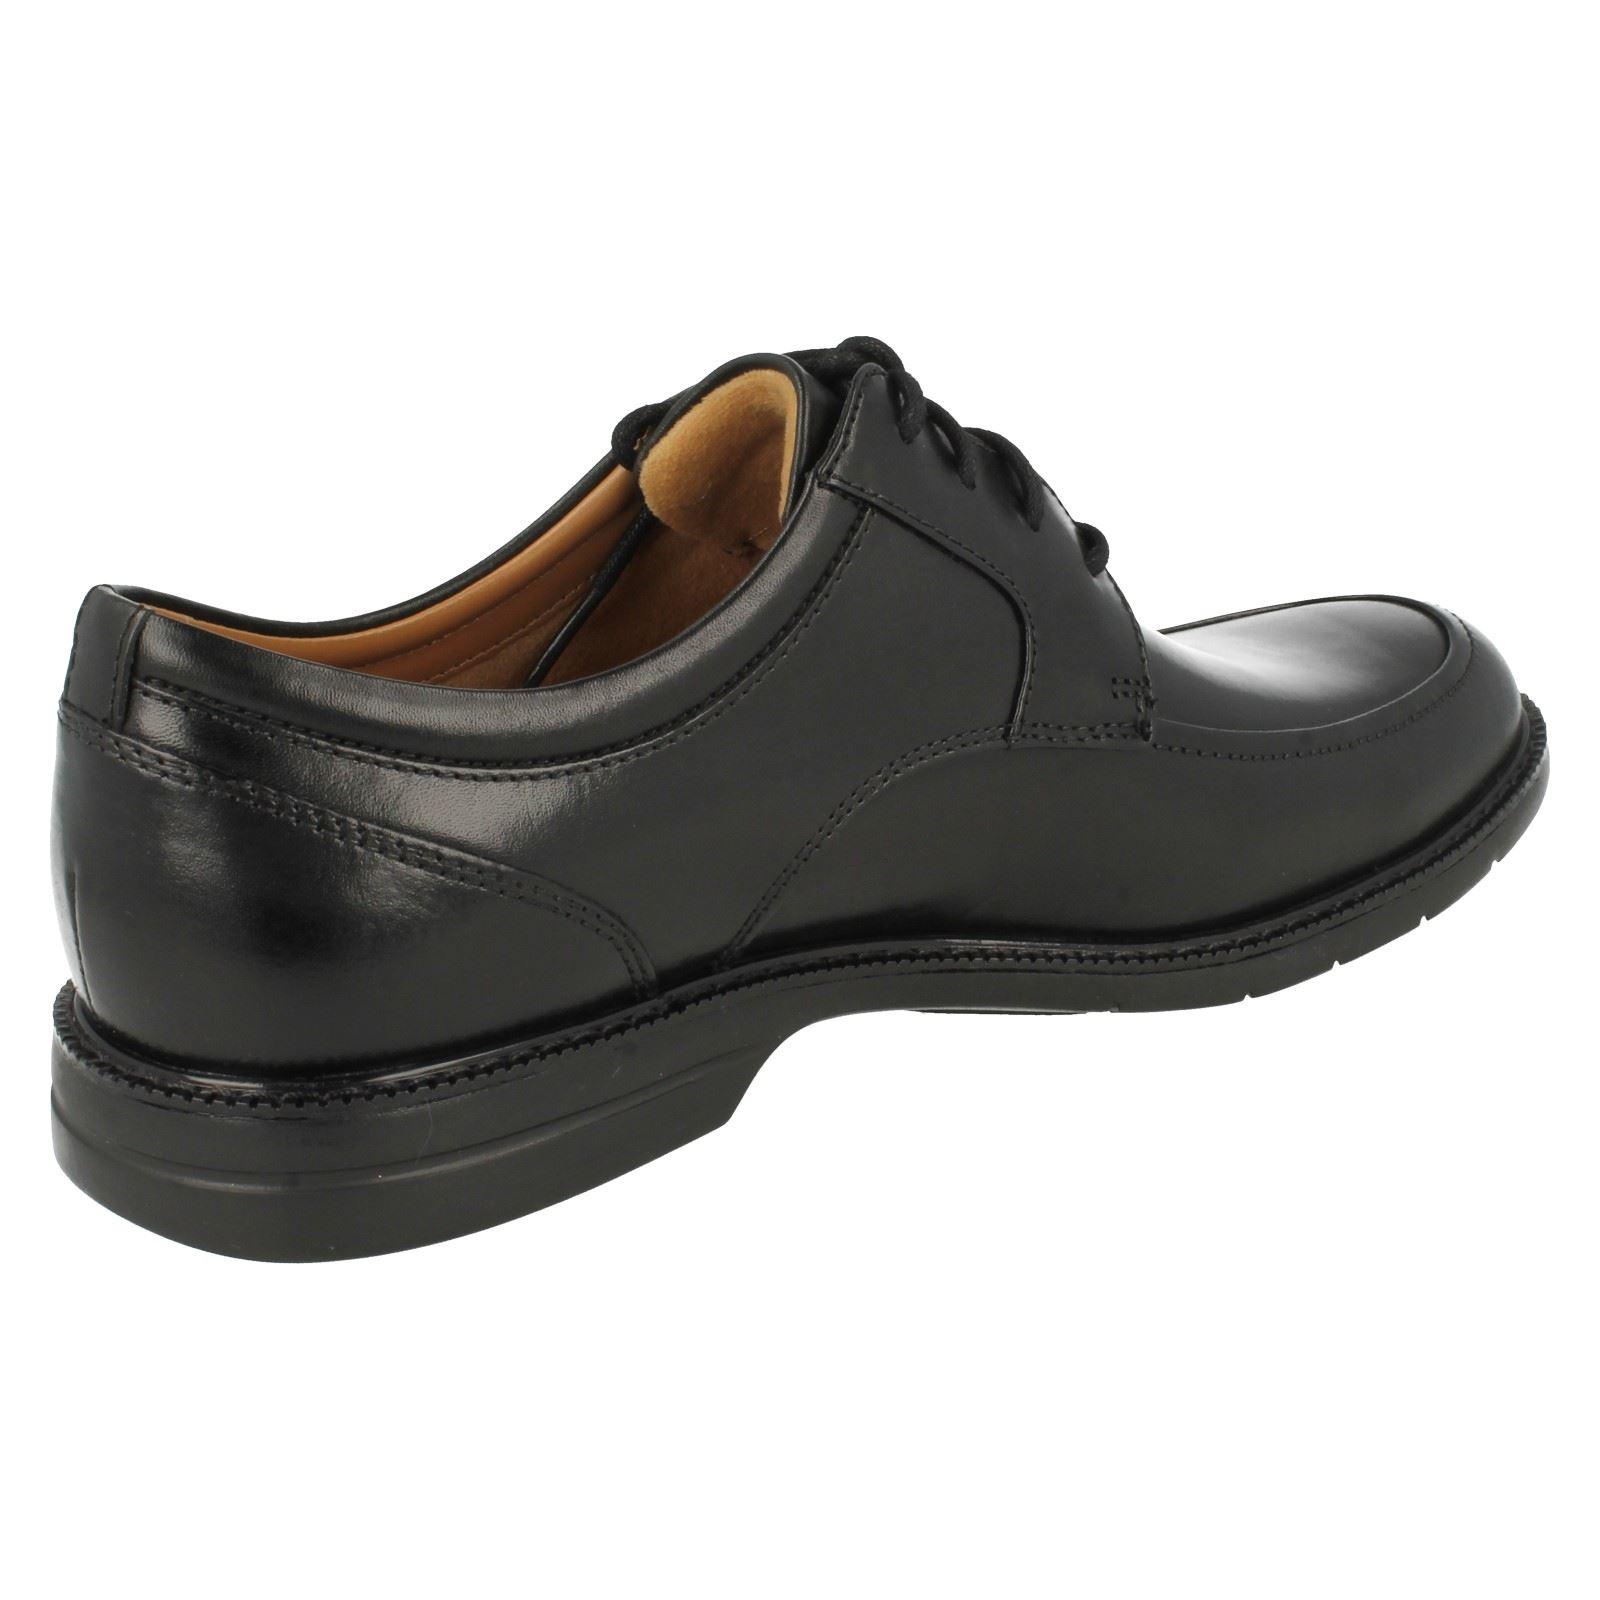 Herren Clarks Formal Lace Up Schuhes Bilton Walk 1e81a7